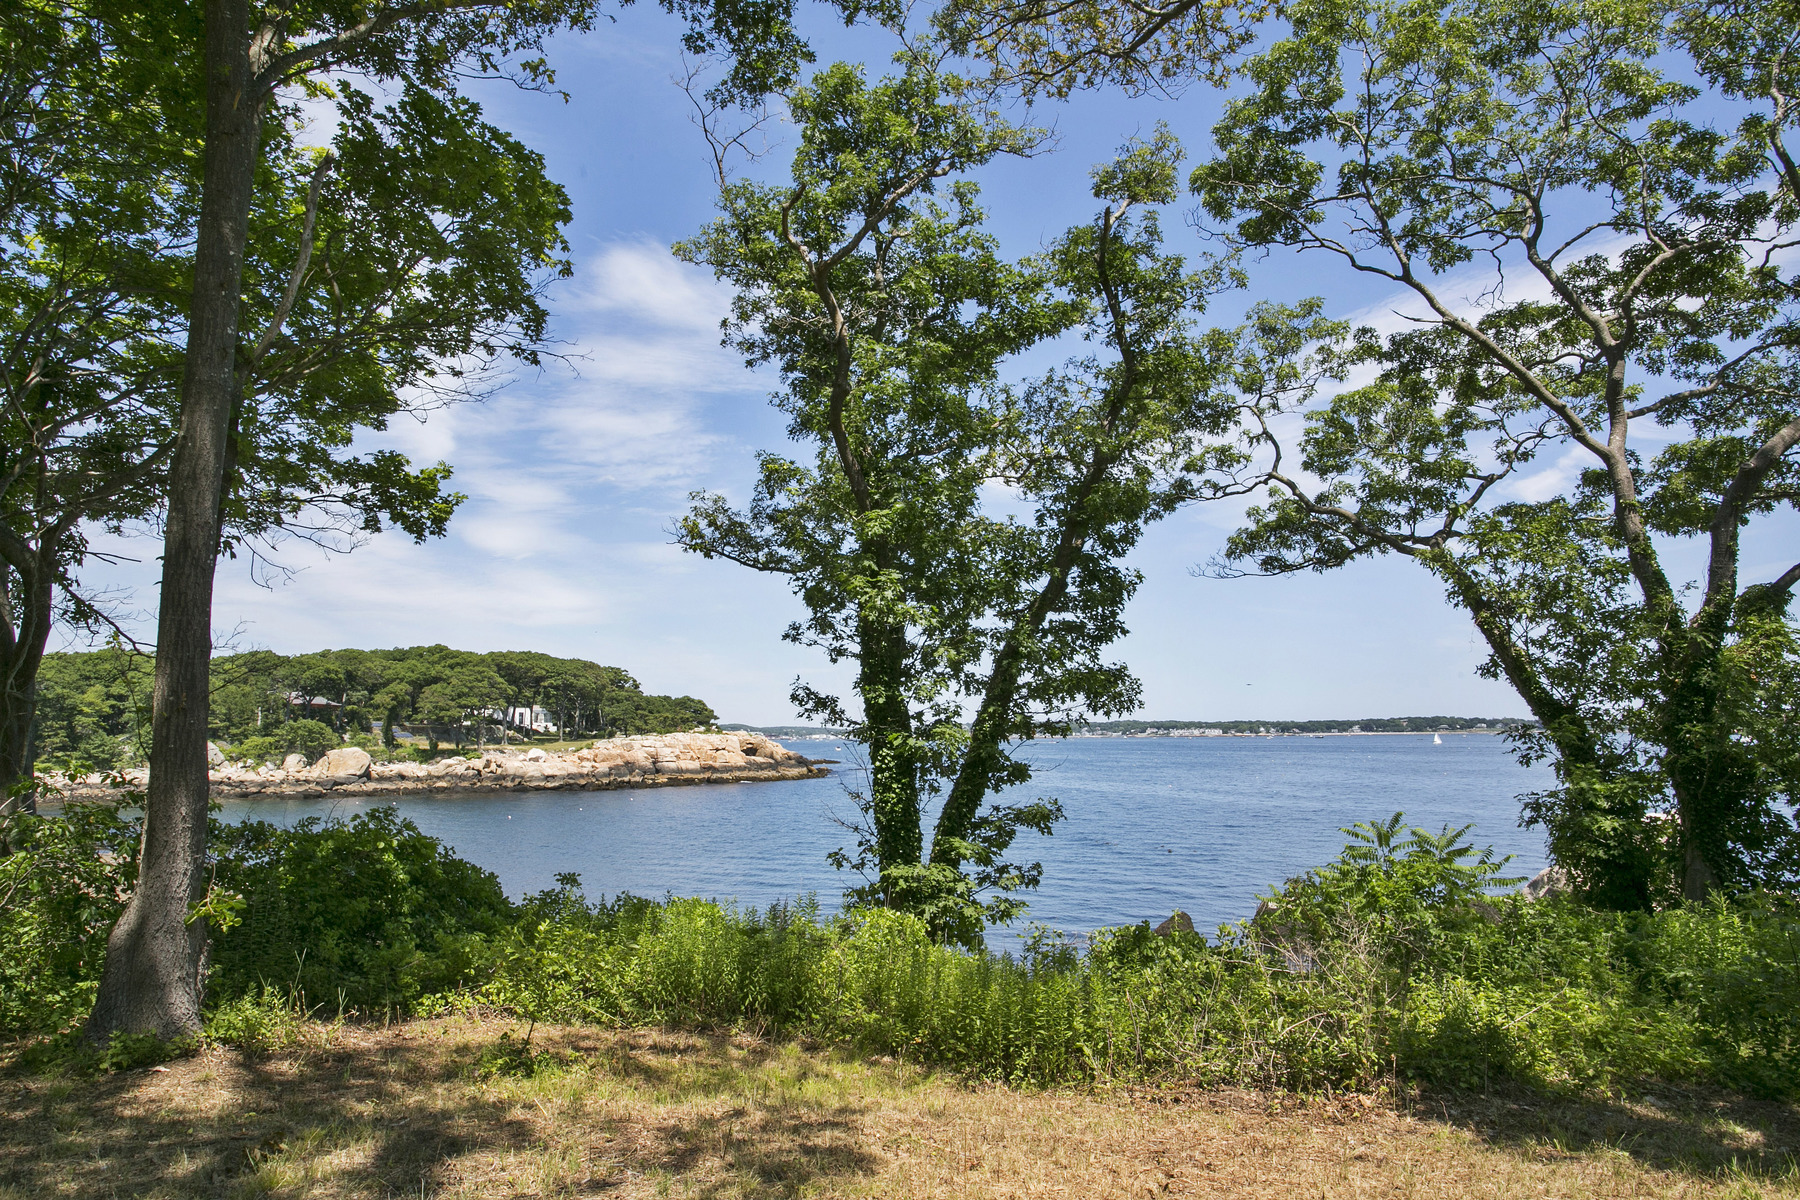 Casa para uma família para Venda às Phenomenal Water Views 42 Mussell Point Road Gloucester, Massachusetts, 01930 Estados Unidos